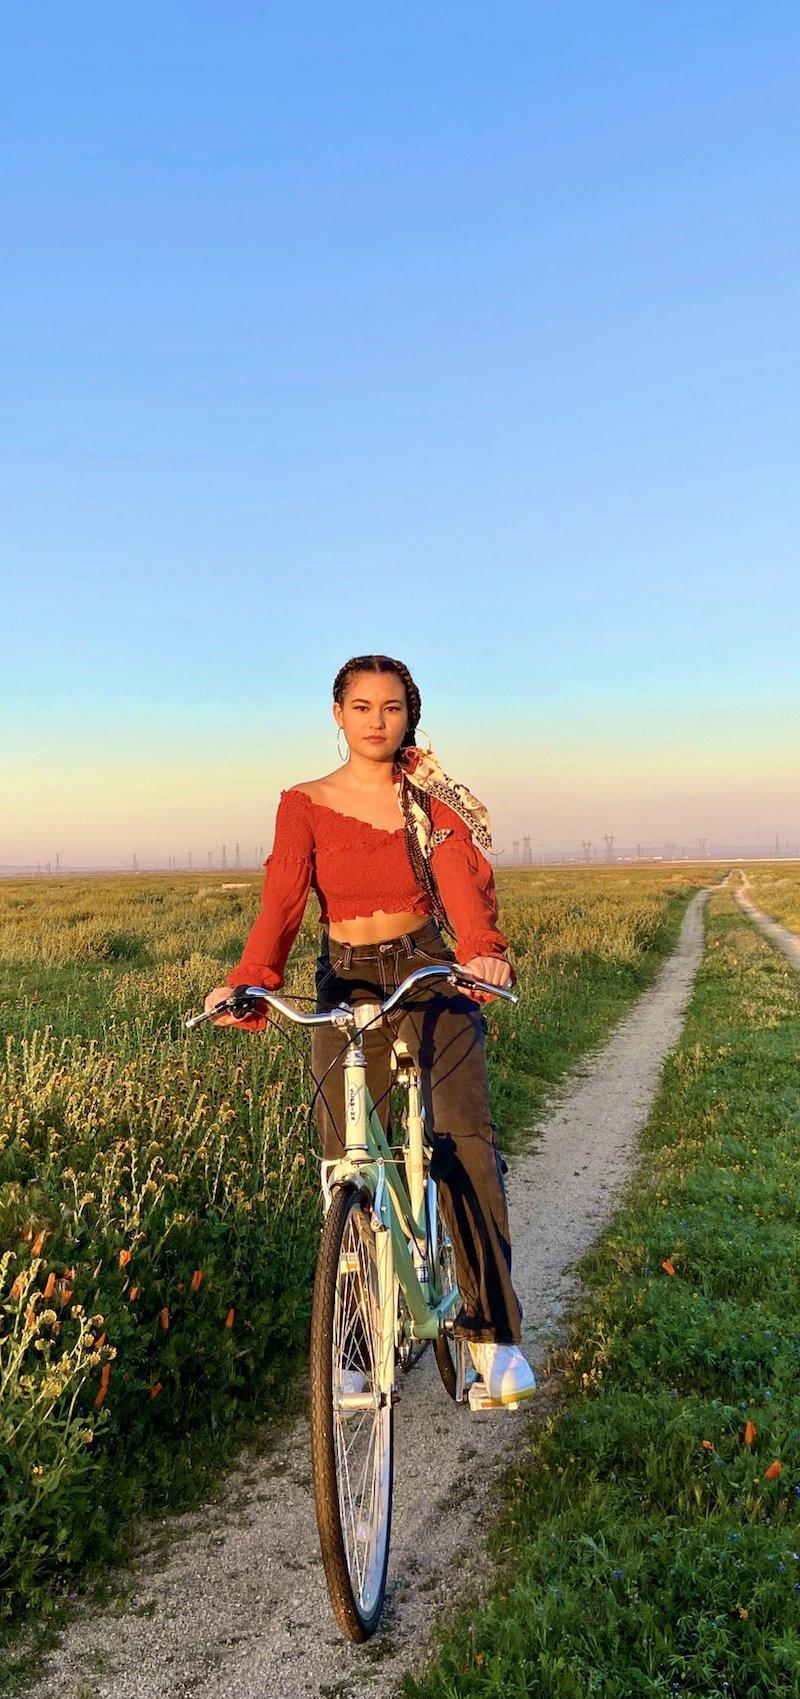 Naomicheyanne riding a pedal bike in an open field.